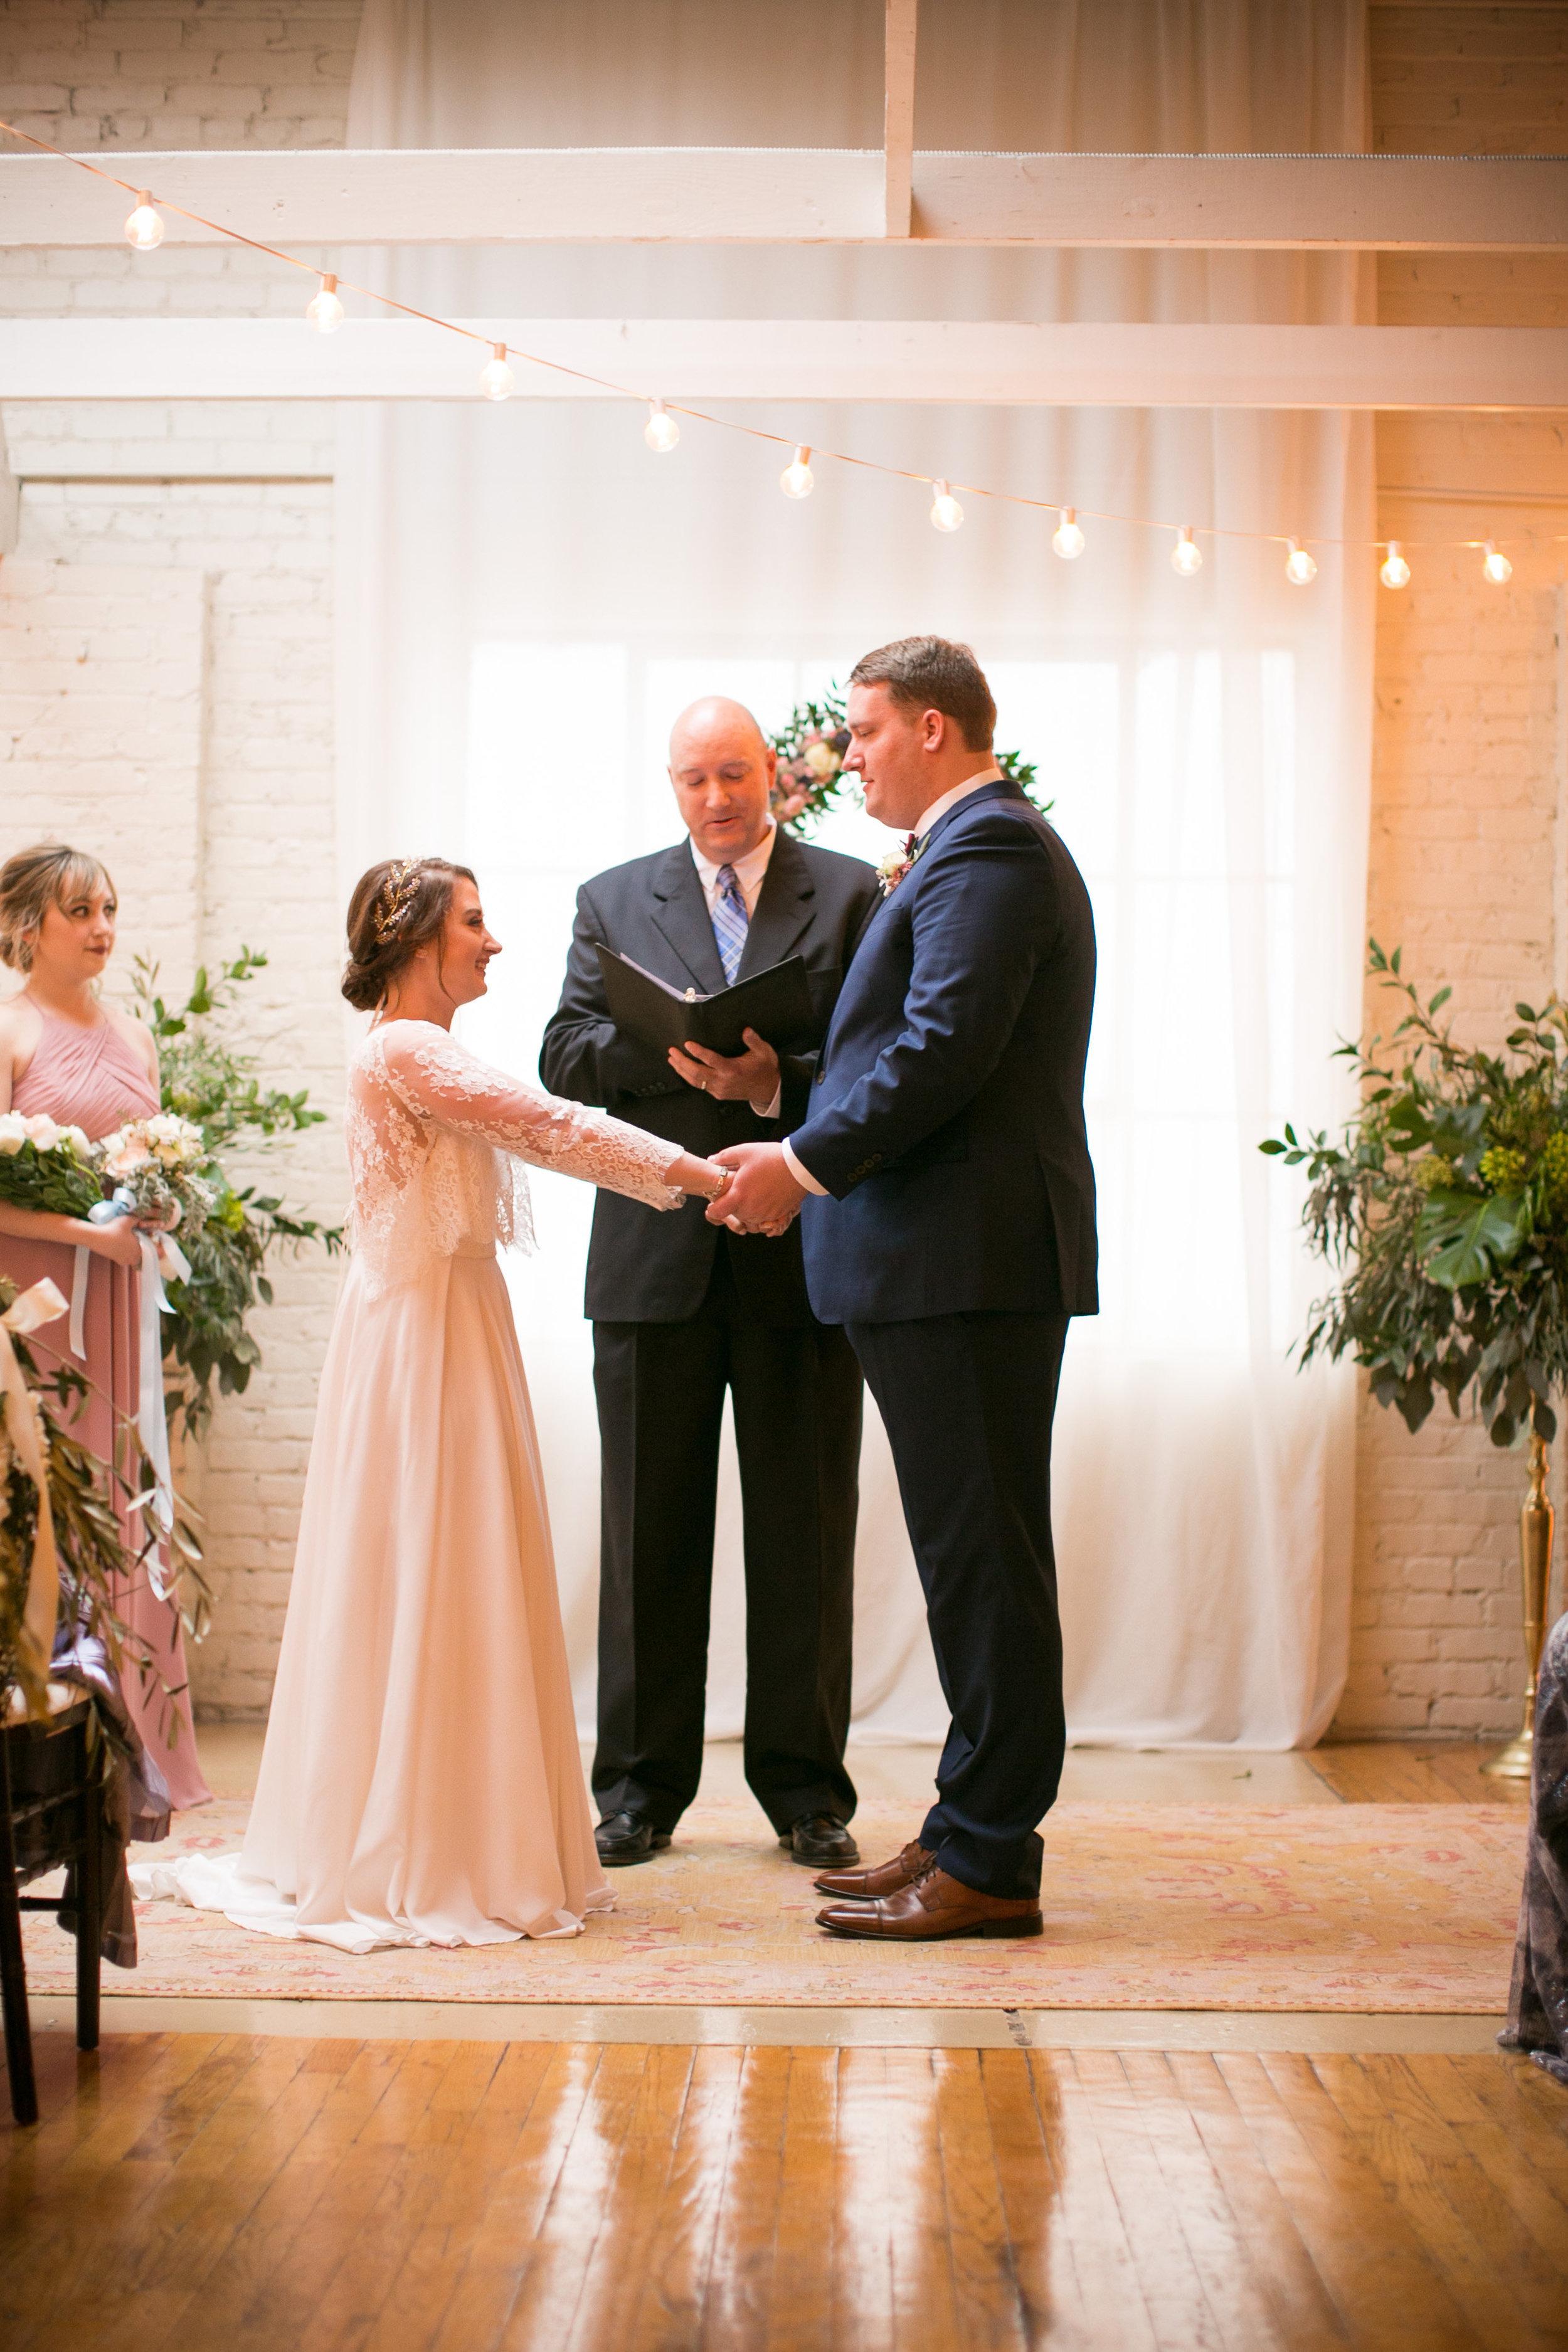 Handley Breaux Designs | Southern Wedding, Southern Wedding Planner, Southern Bride, Alabama Wedding, Alabama Wedding Planner, Alabama Bride, Birmingham Bride, Birmingham Wedding, Birmingham Wedding Planner, Spring Wedding, March Wedding